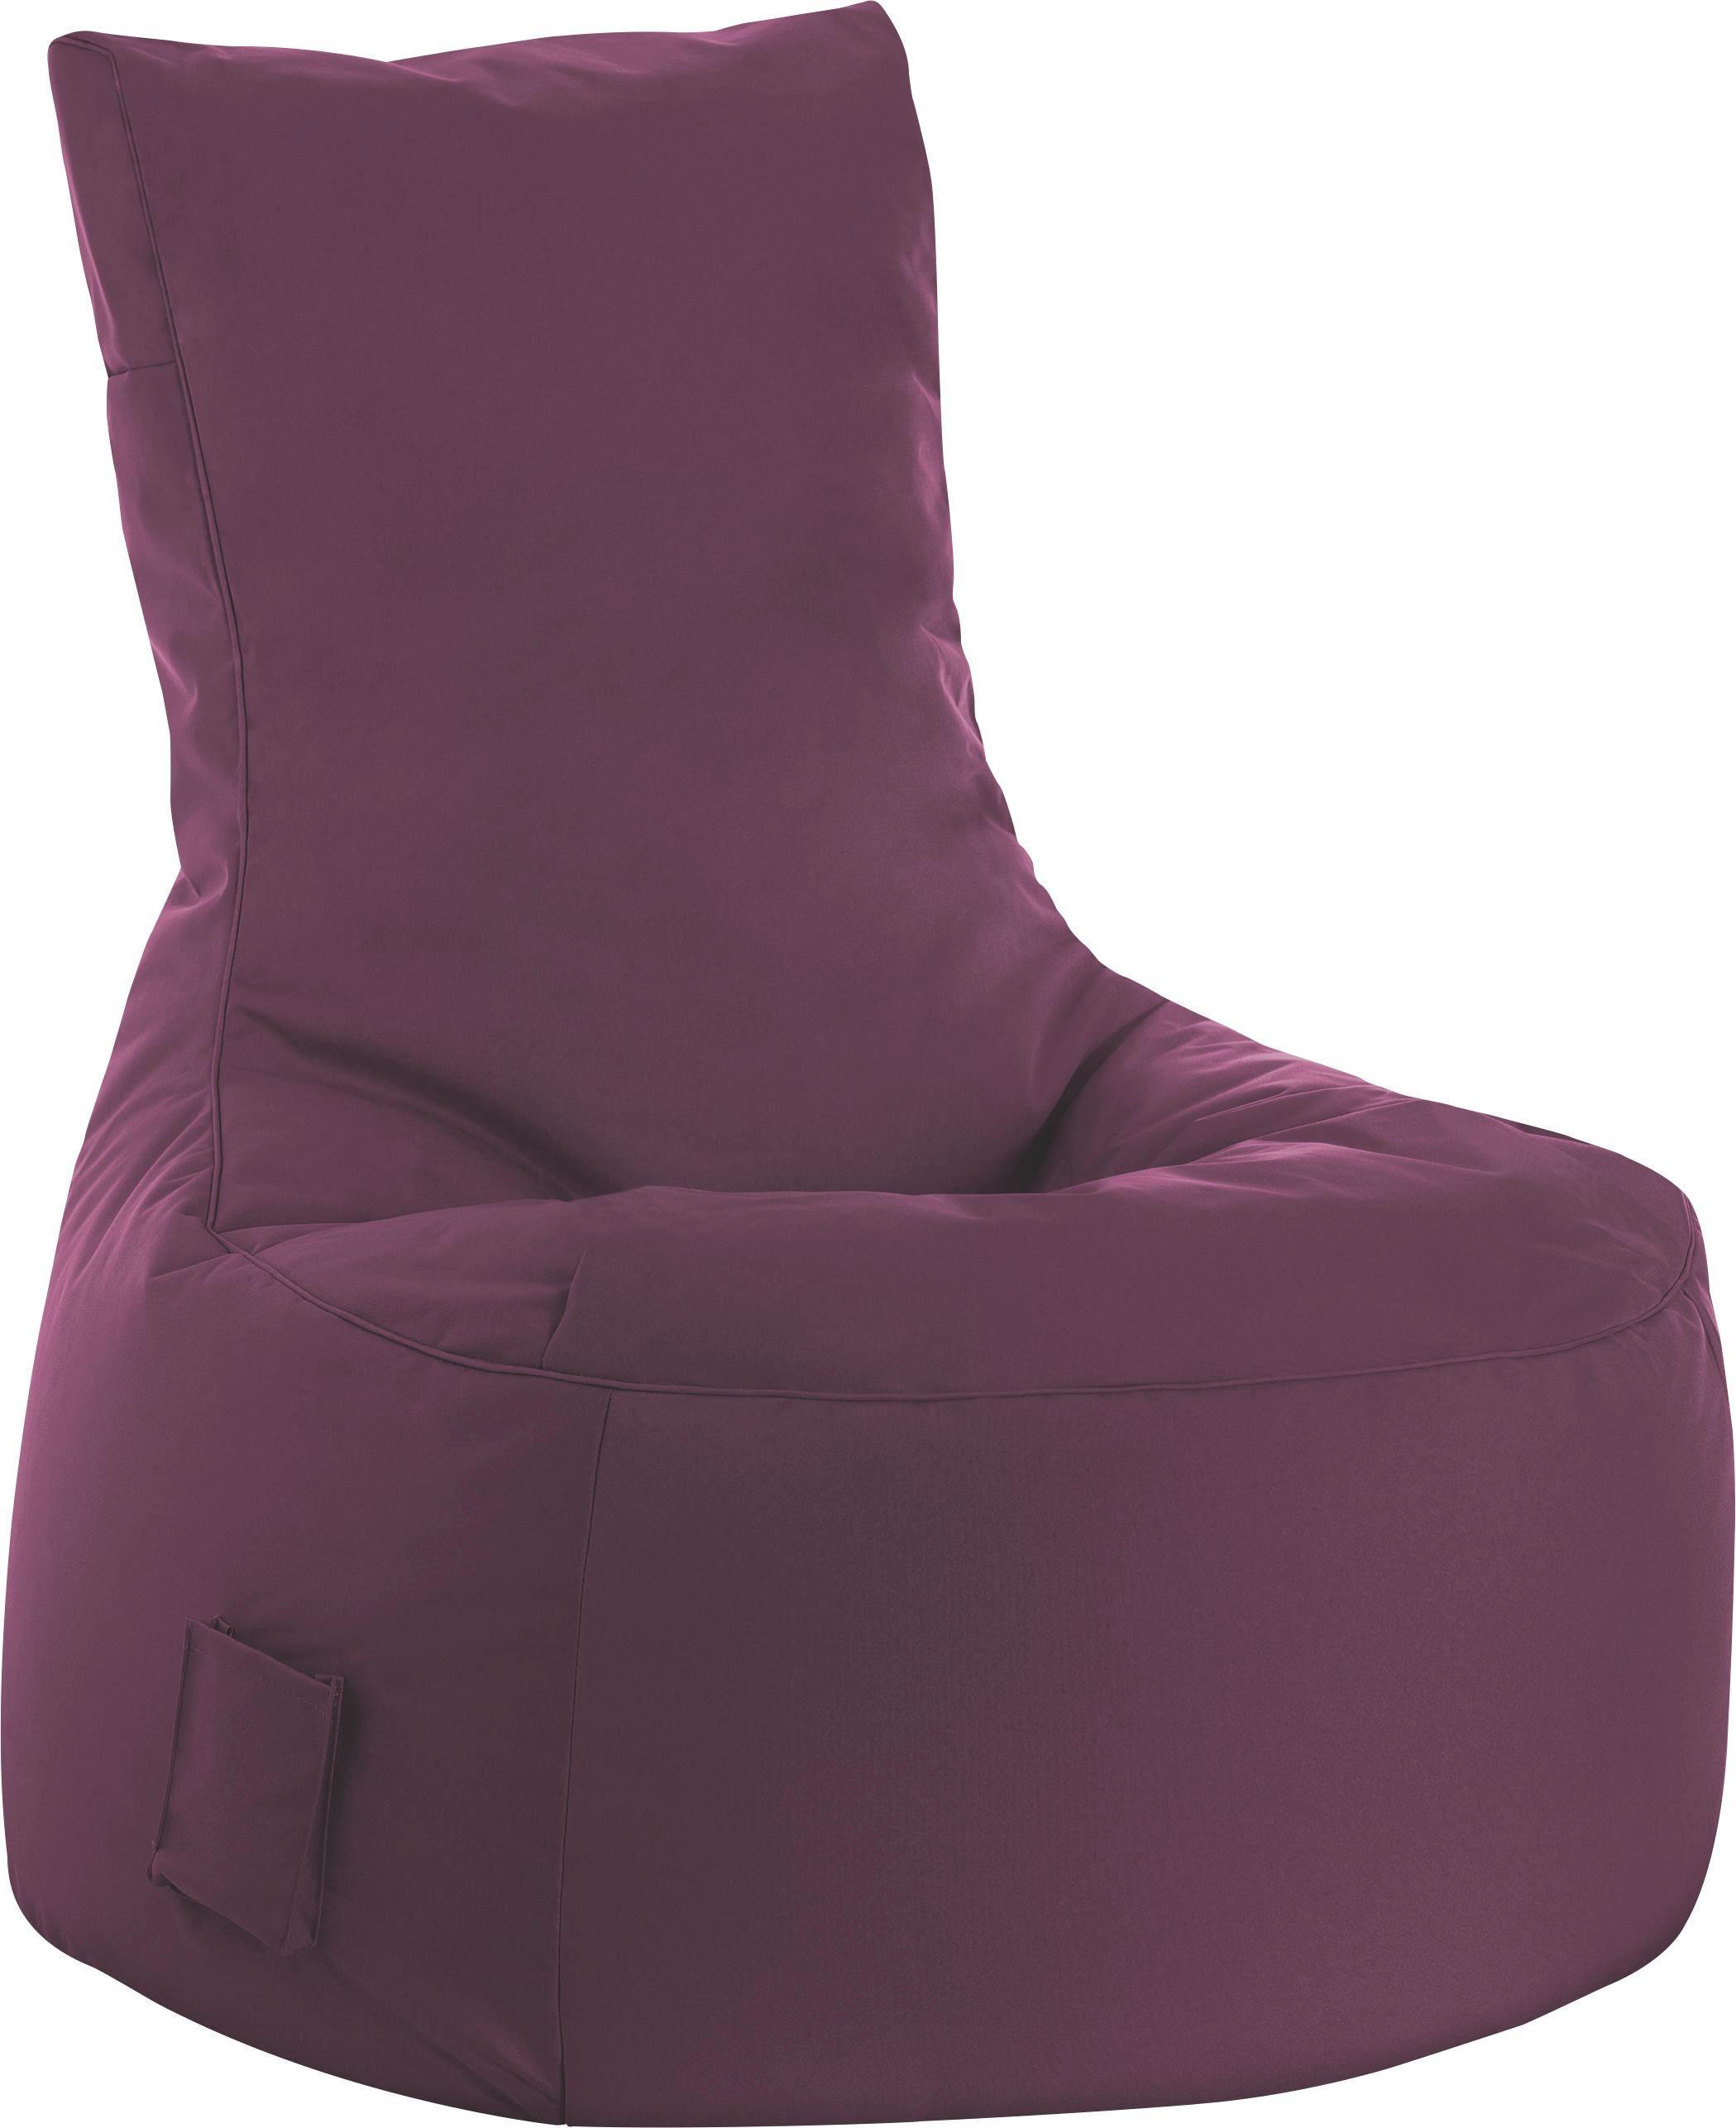 SITZSACK Aubergine - Aubergine, MODERN, Textil (90/95/65cm) - CARRYHOME